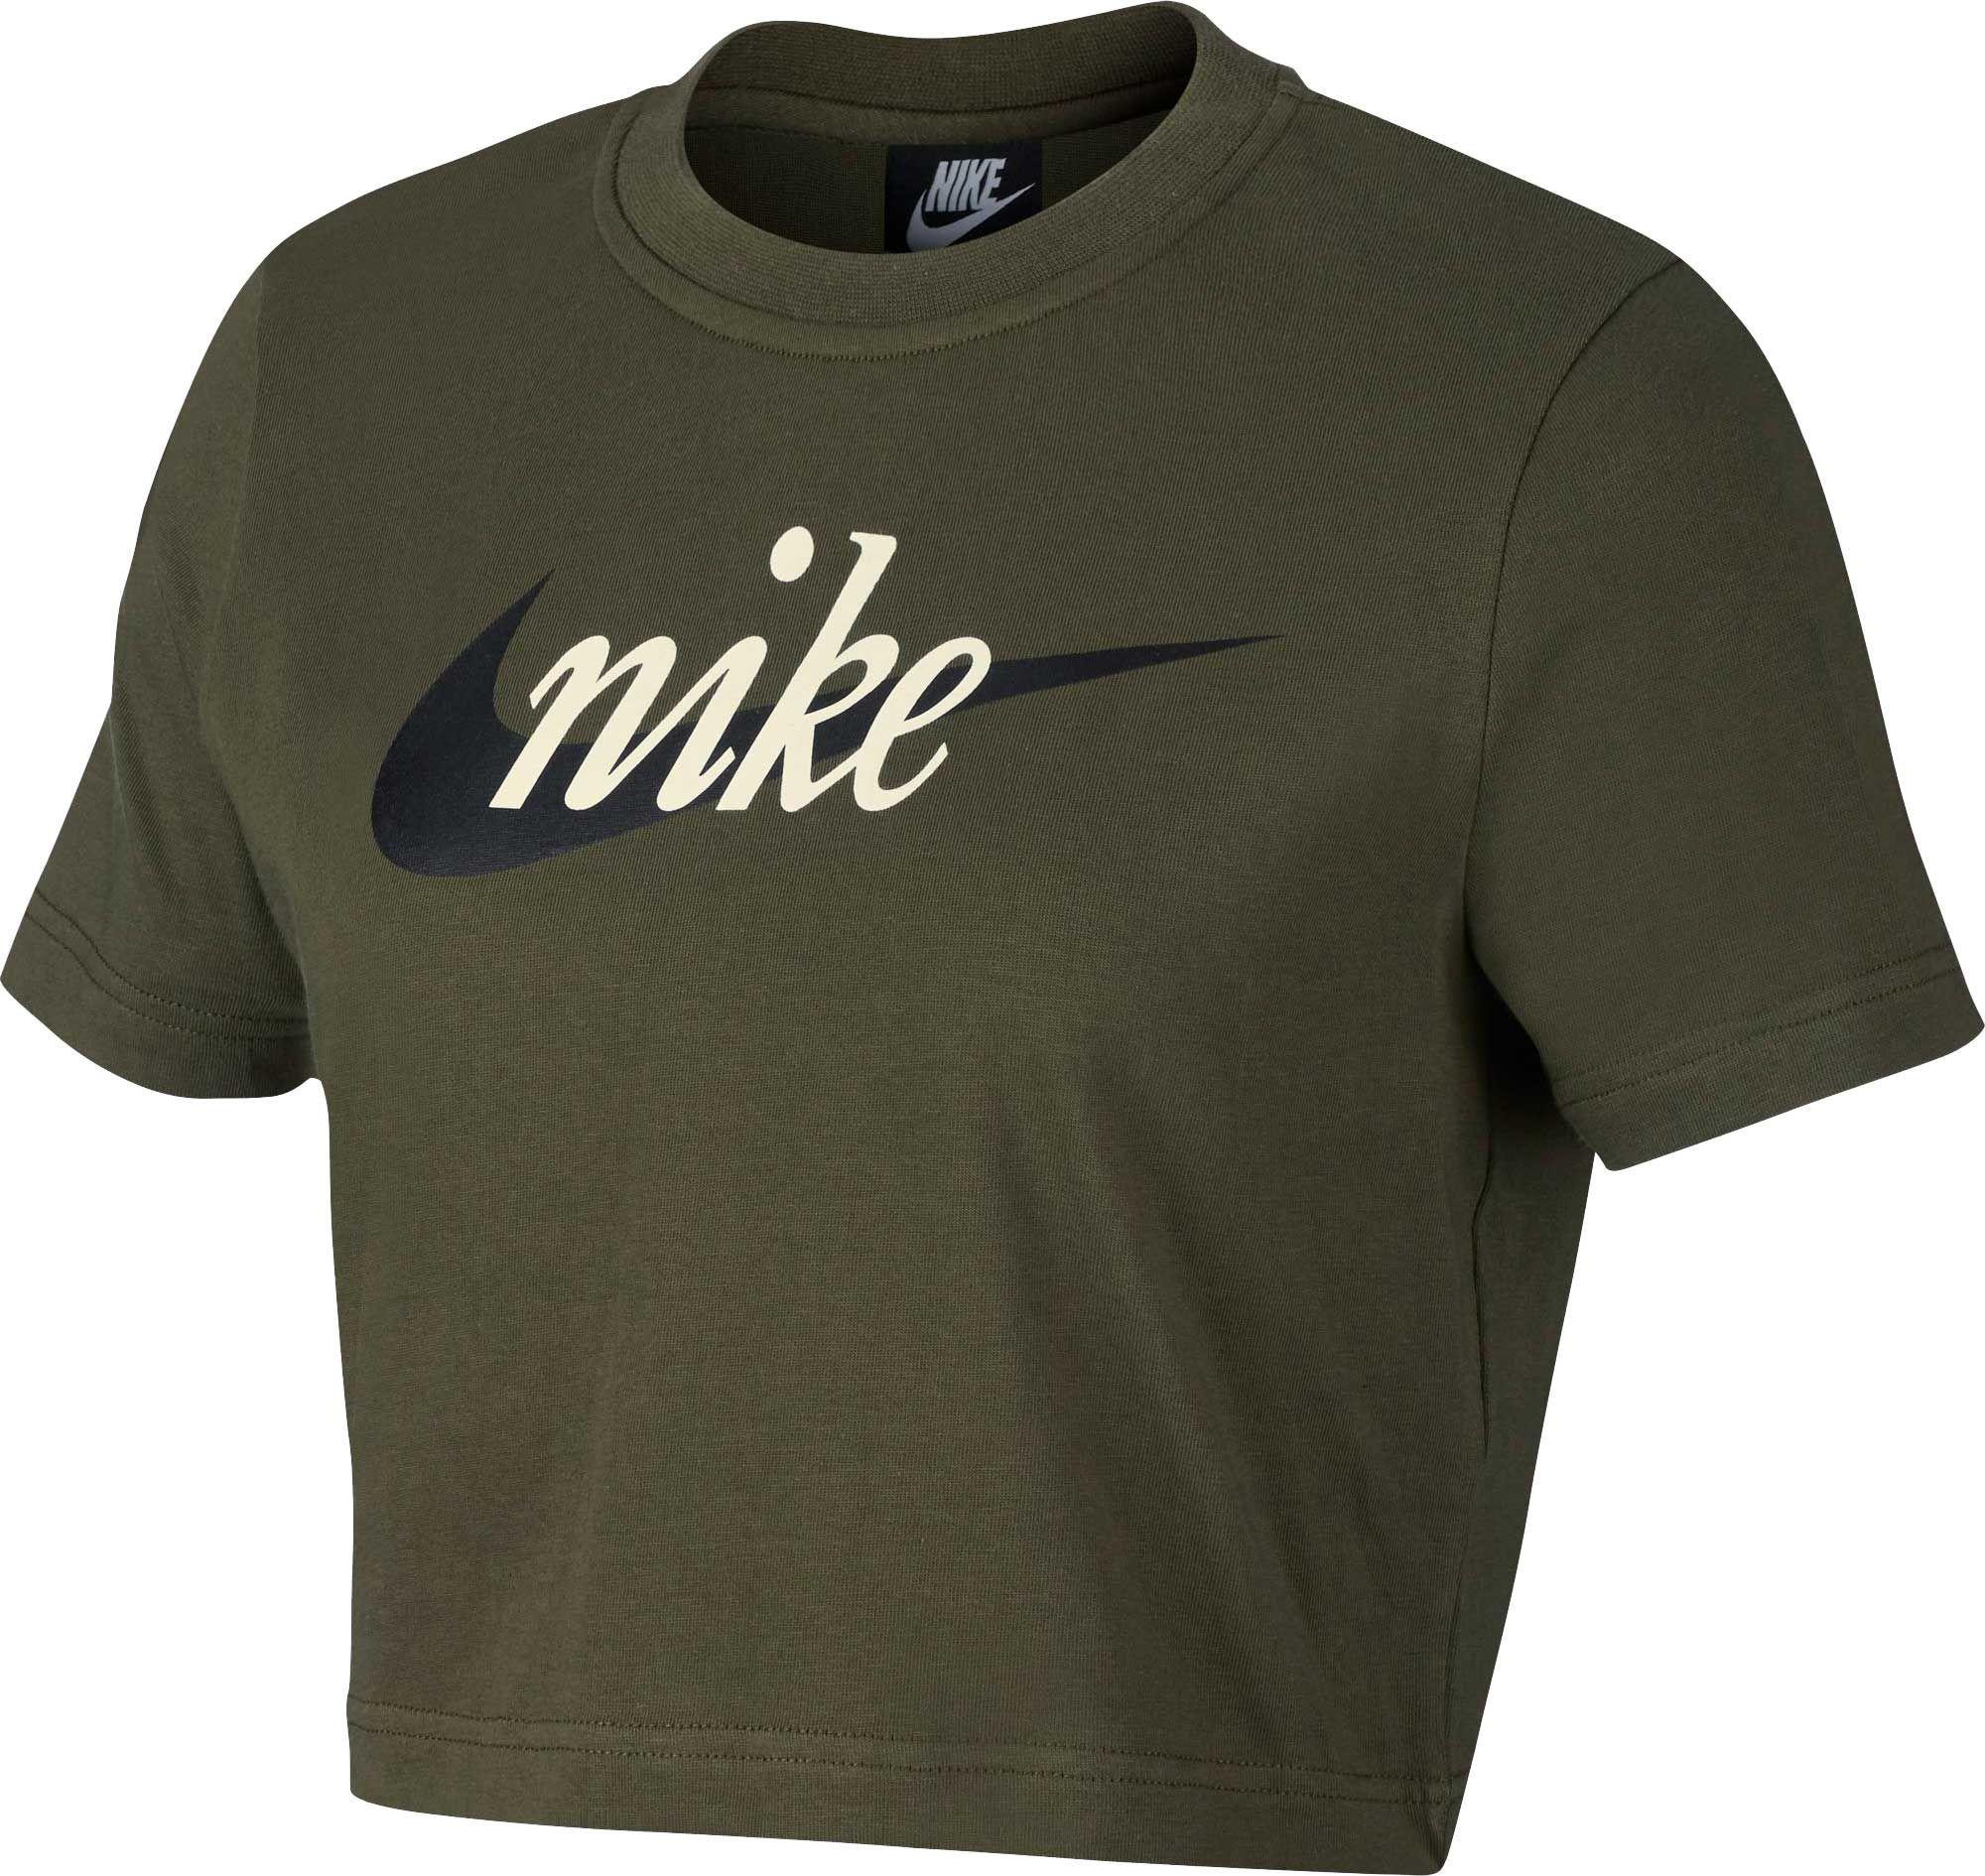 eeda4da7 Nike Women's Sportswear Crop T-Shirt in 2019 | Products | Nike ...